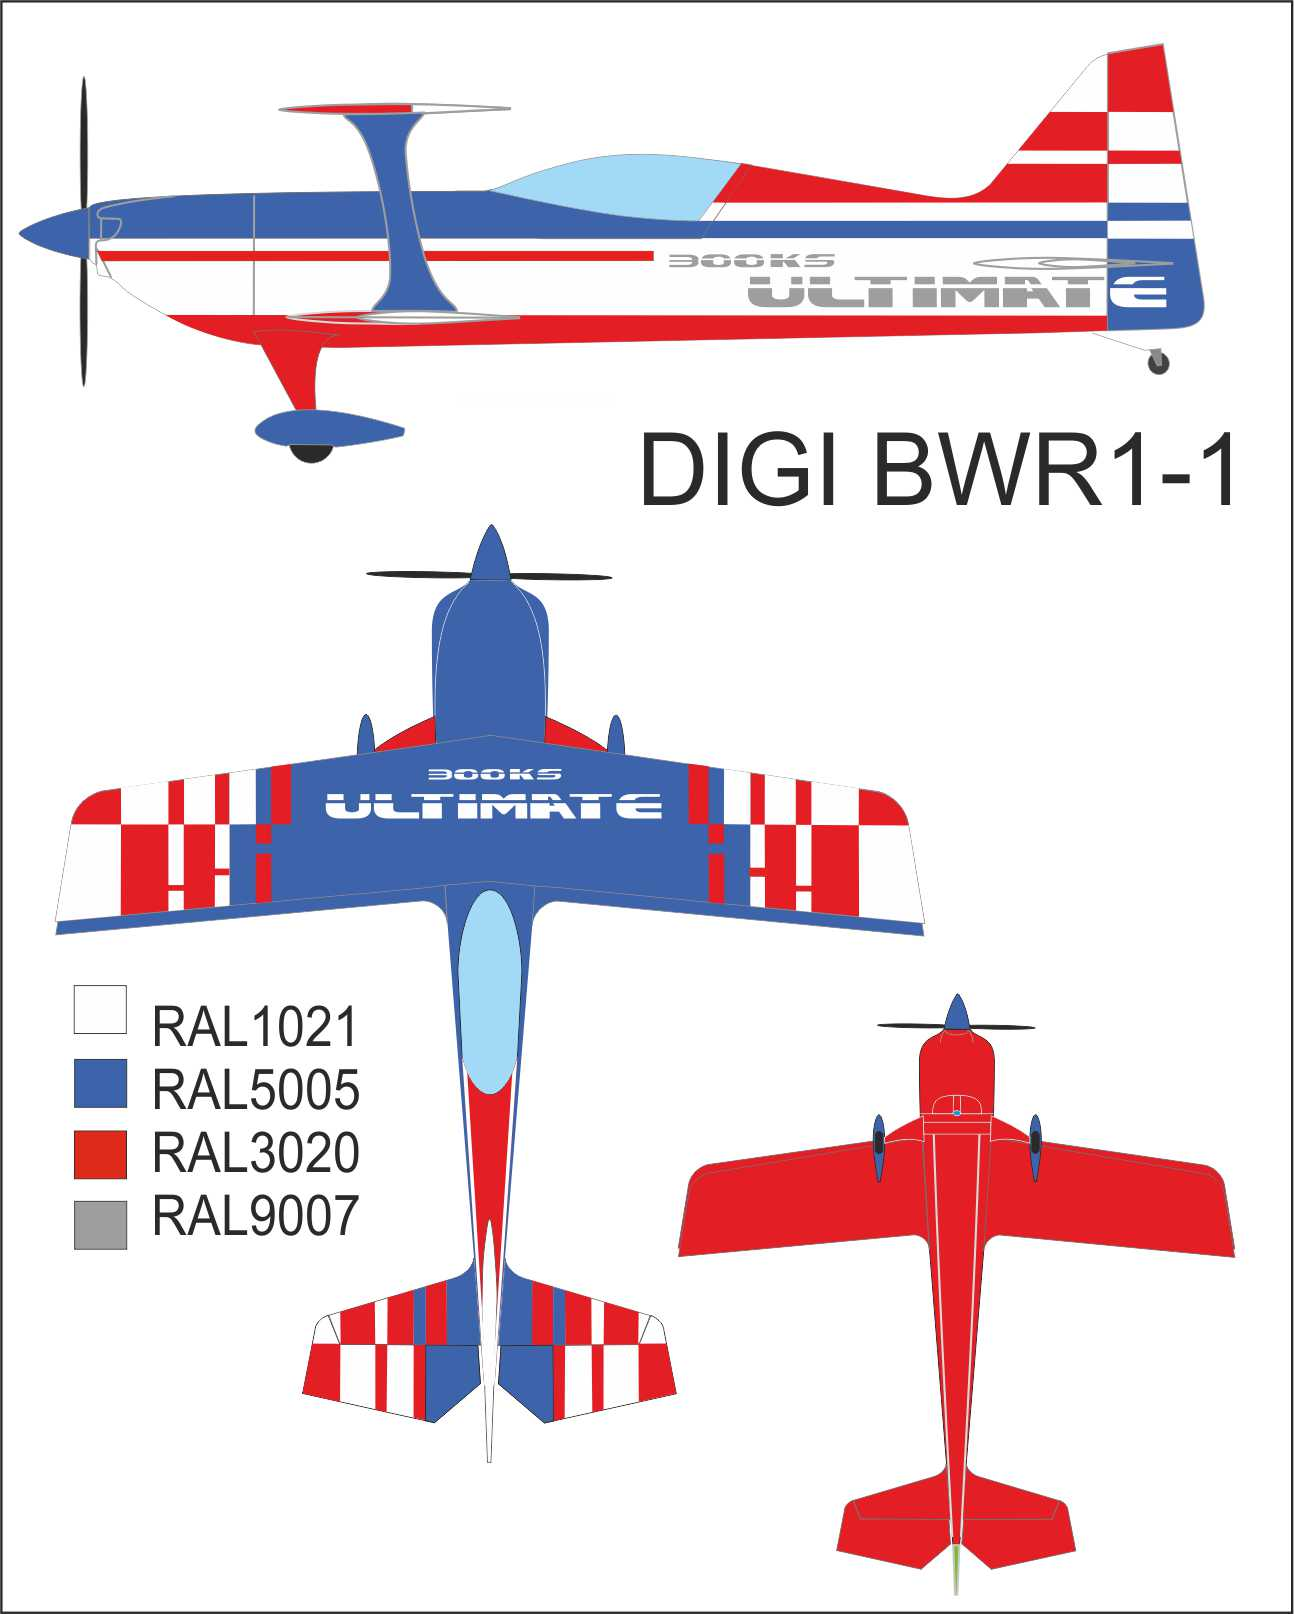 ULT DIGI BWR1-1.jpg